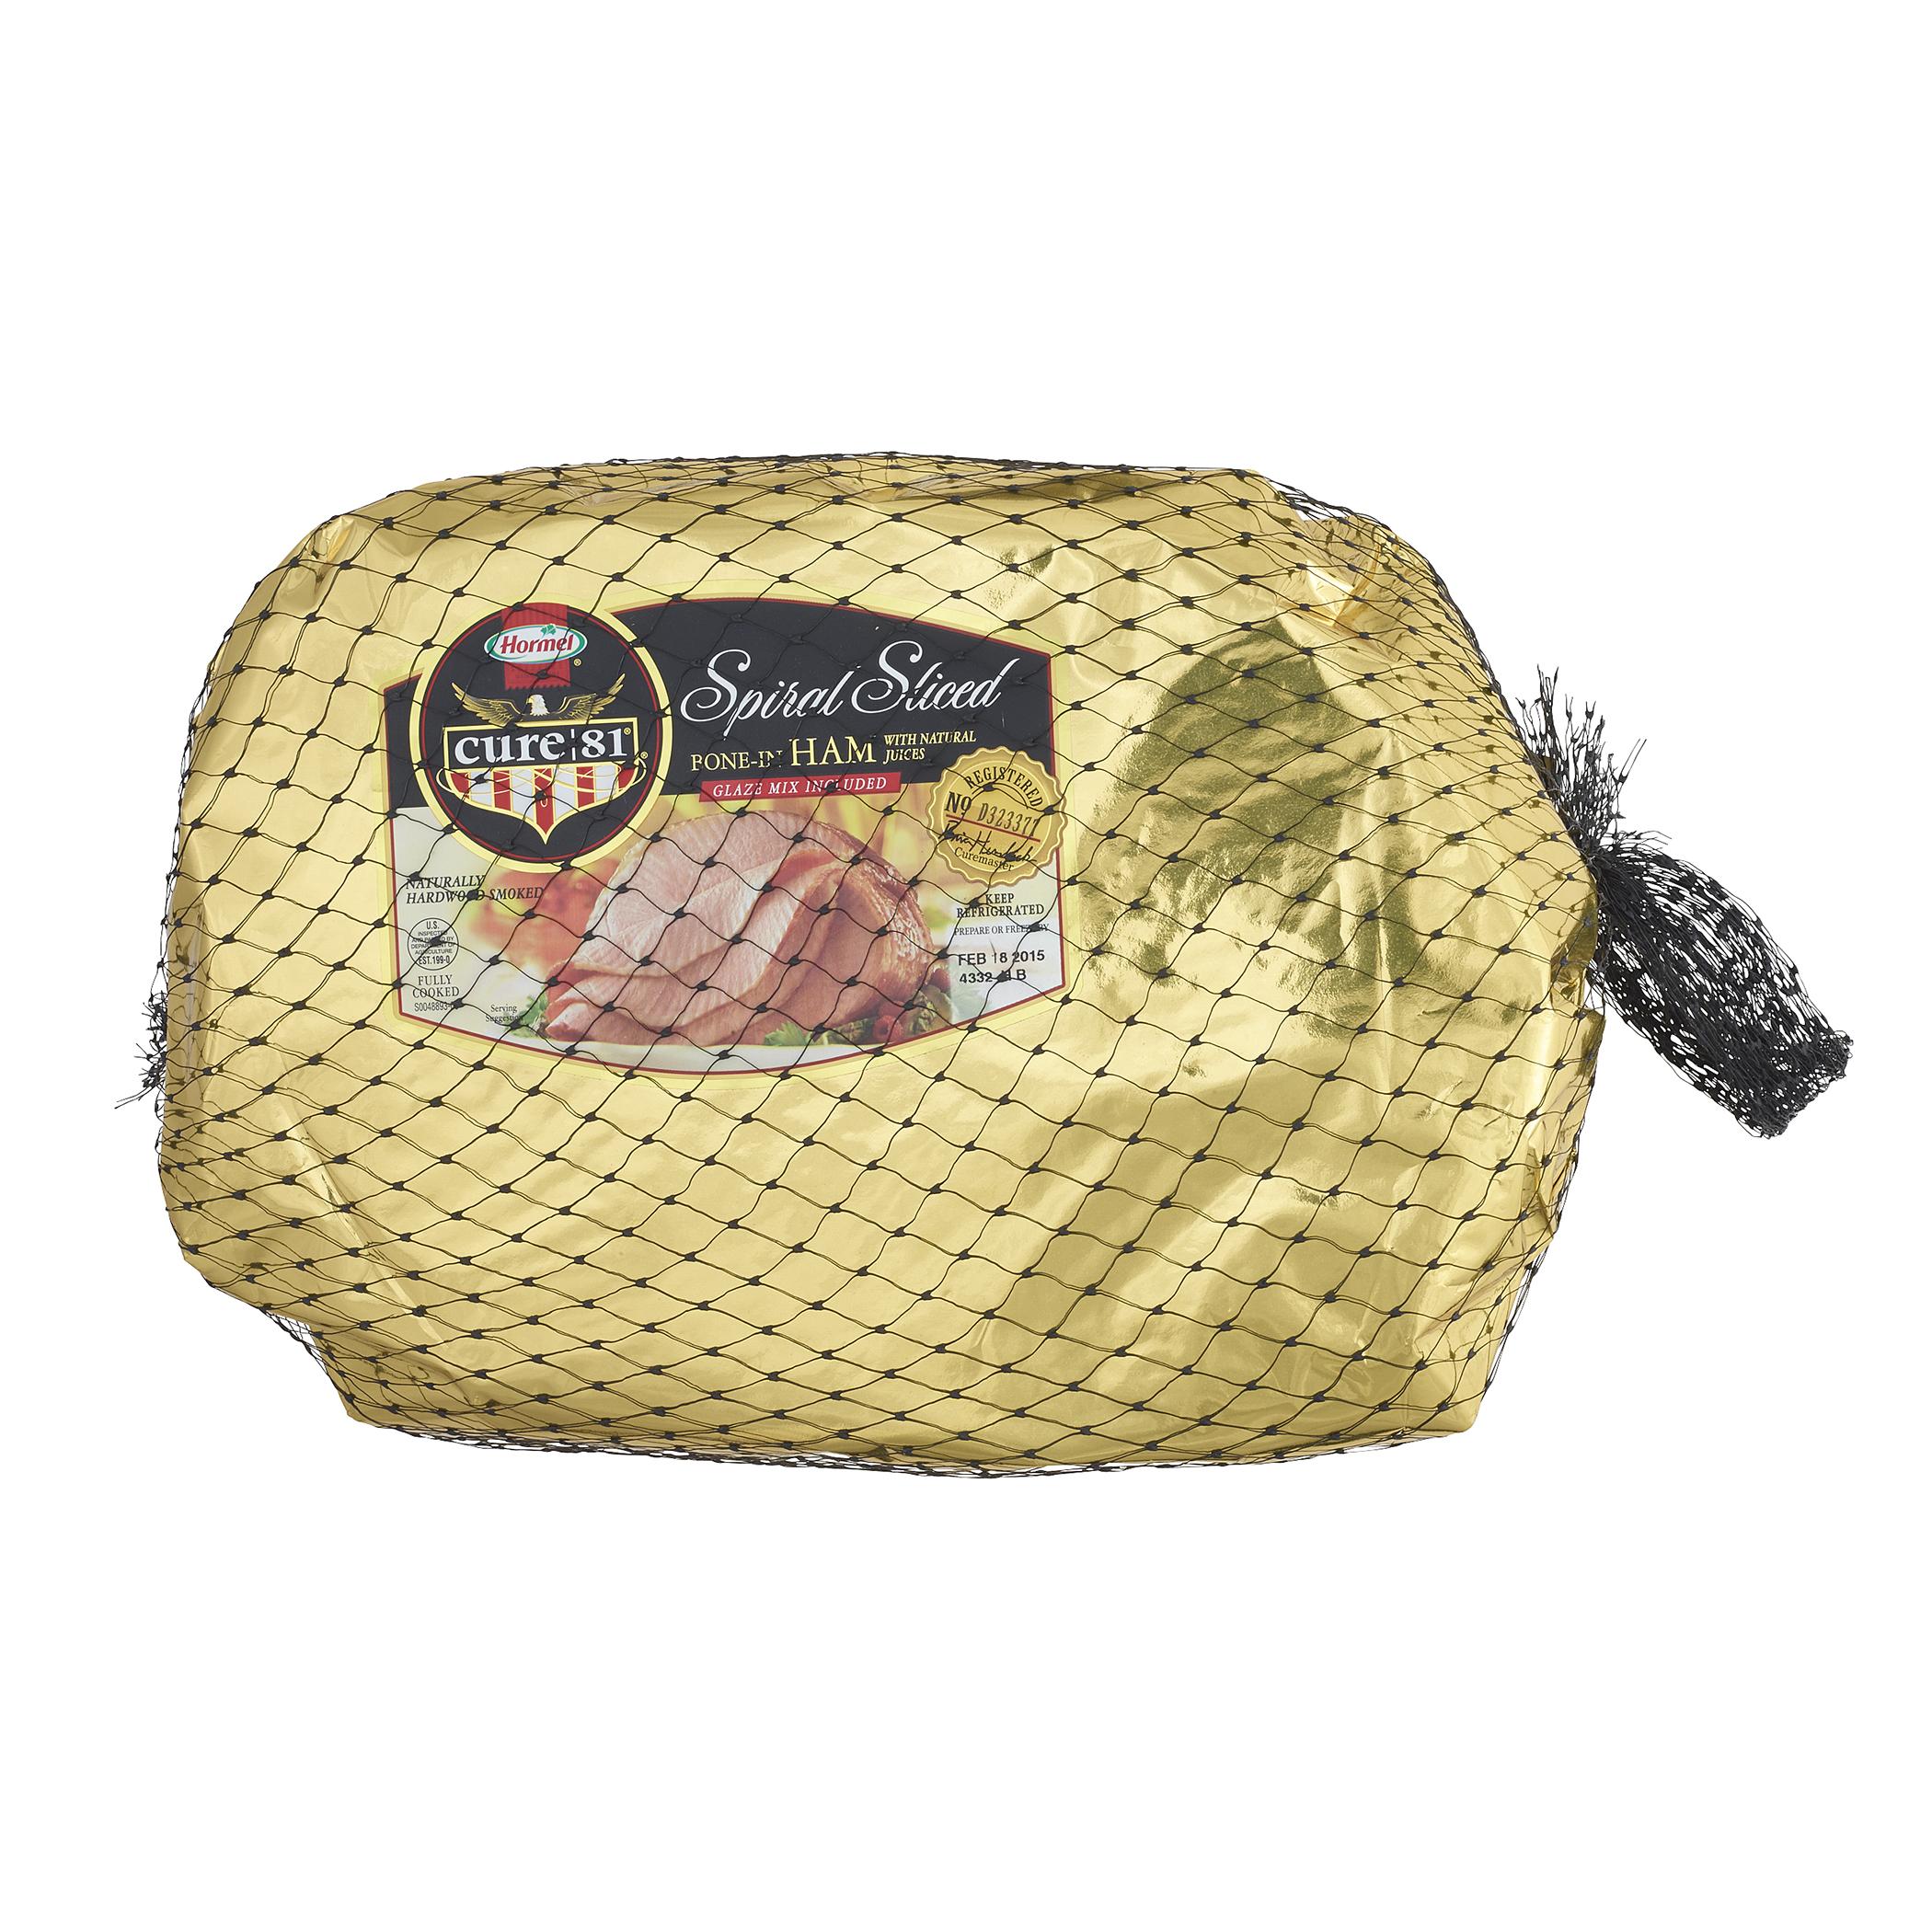 Ham and cheese monkey bread #fortheloveofham big bear's wife.